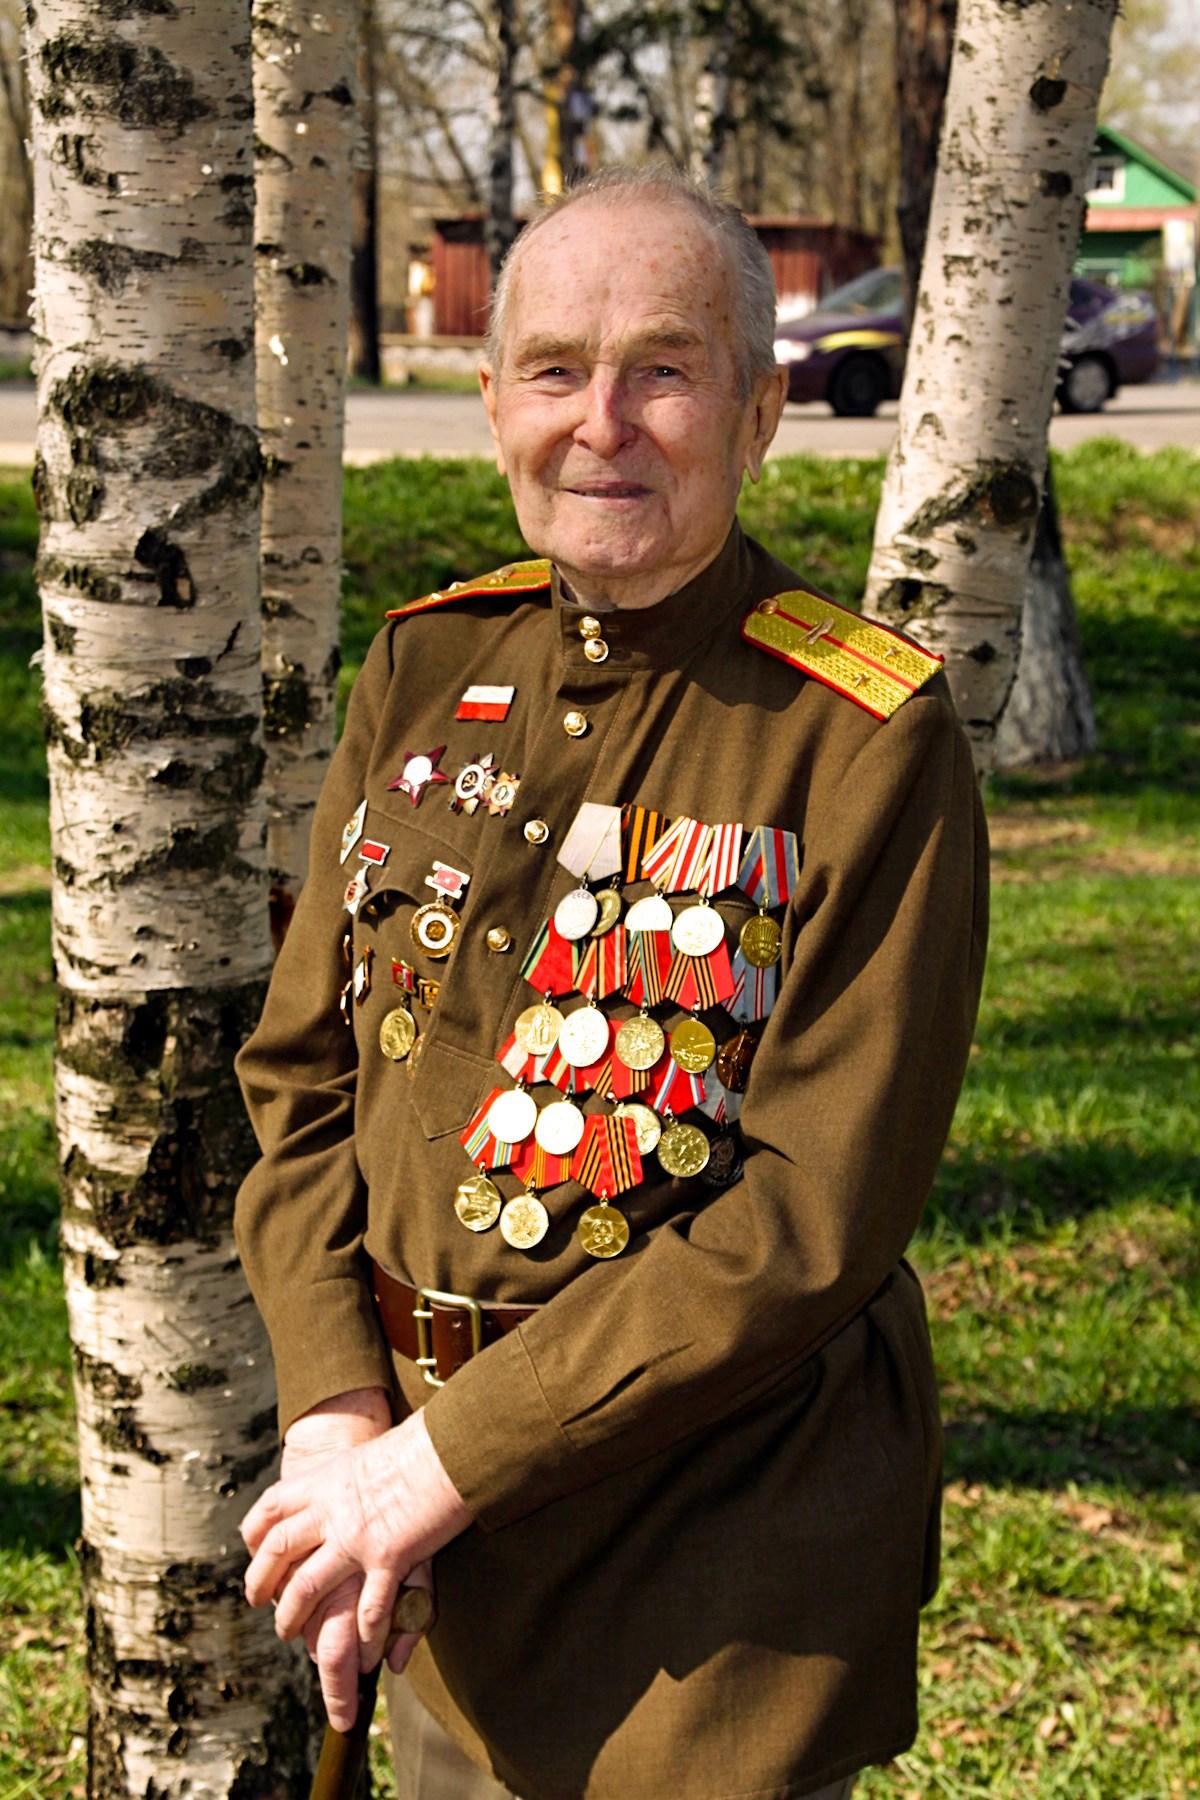 00 Russia. Veteran. 12.05.14